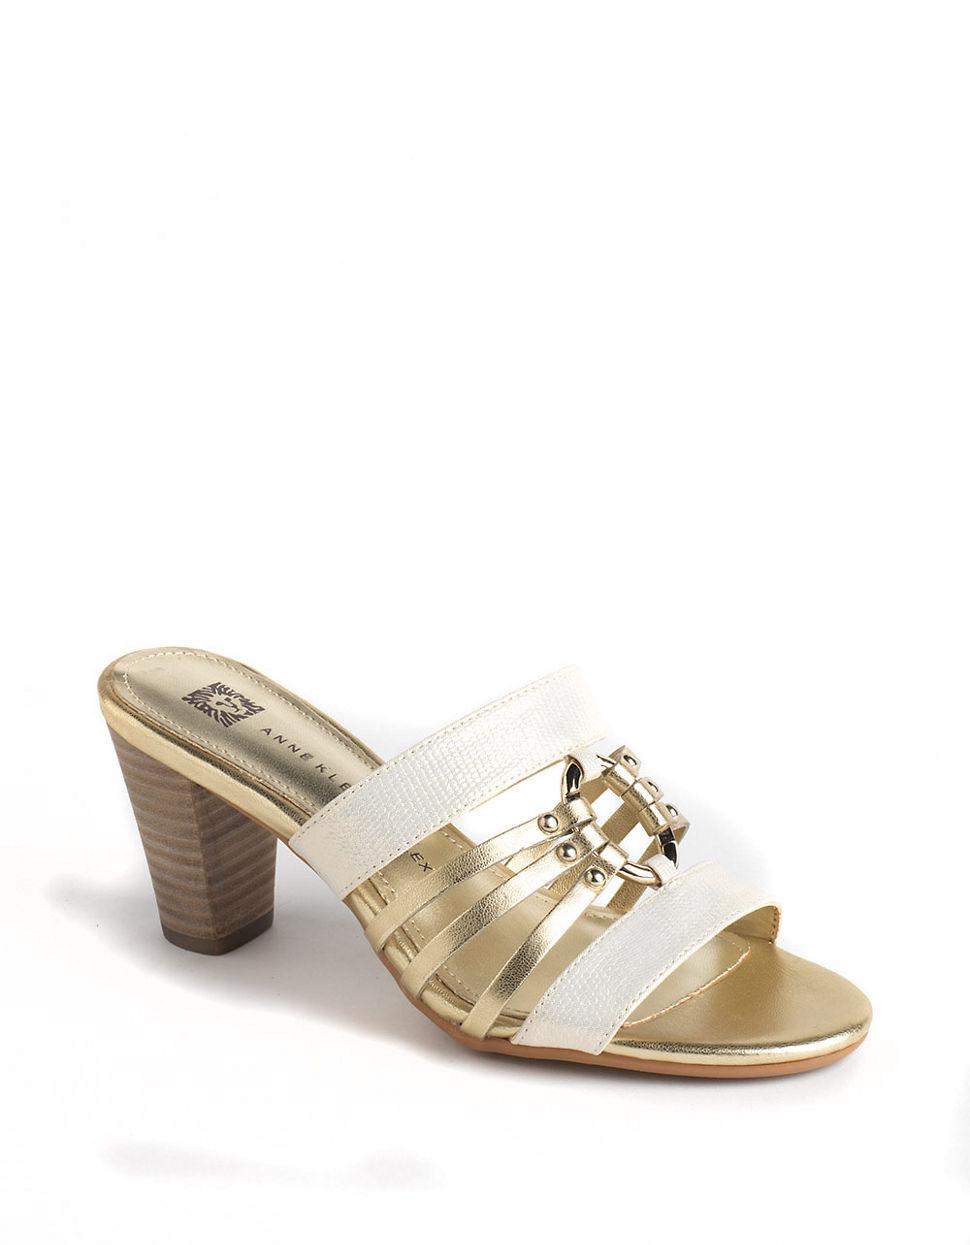 d8a61b19f0 Lyst - Anne Klein Orian Sandals in Metallic